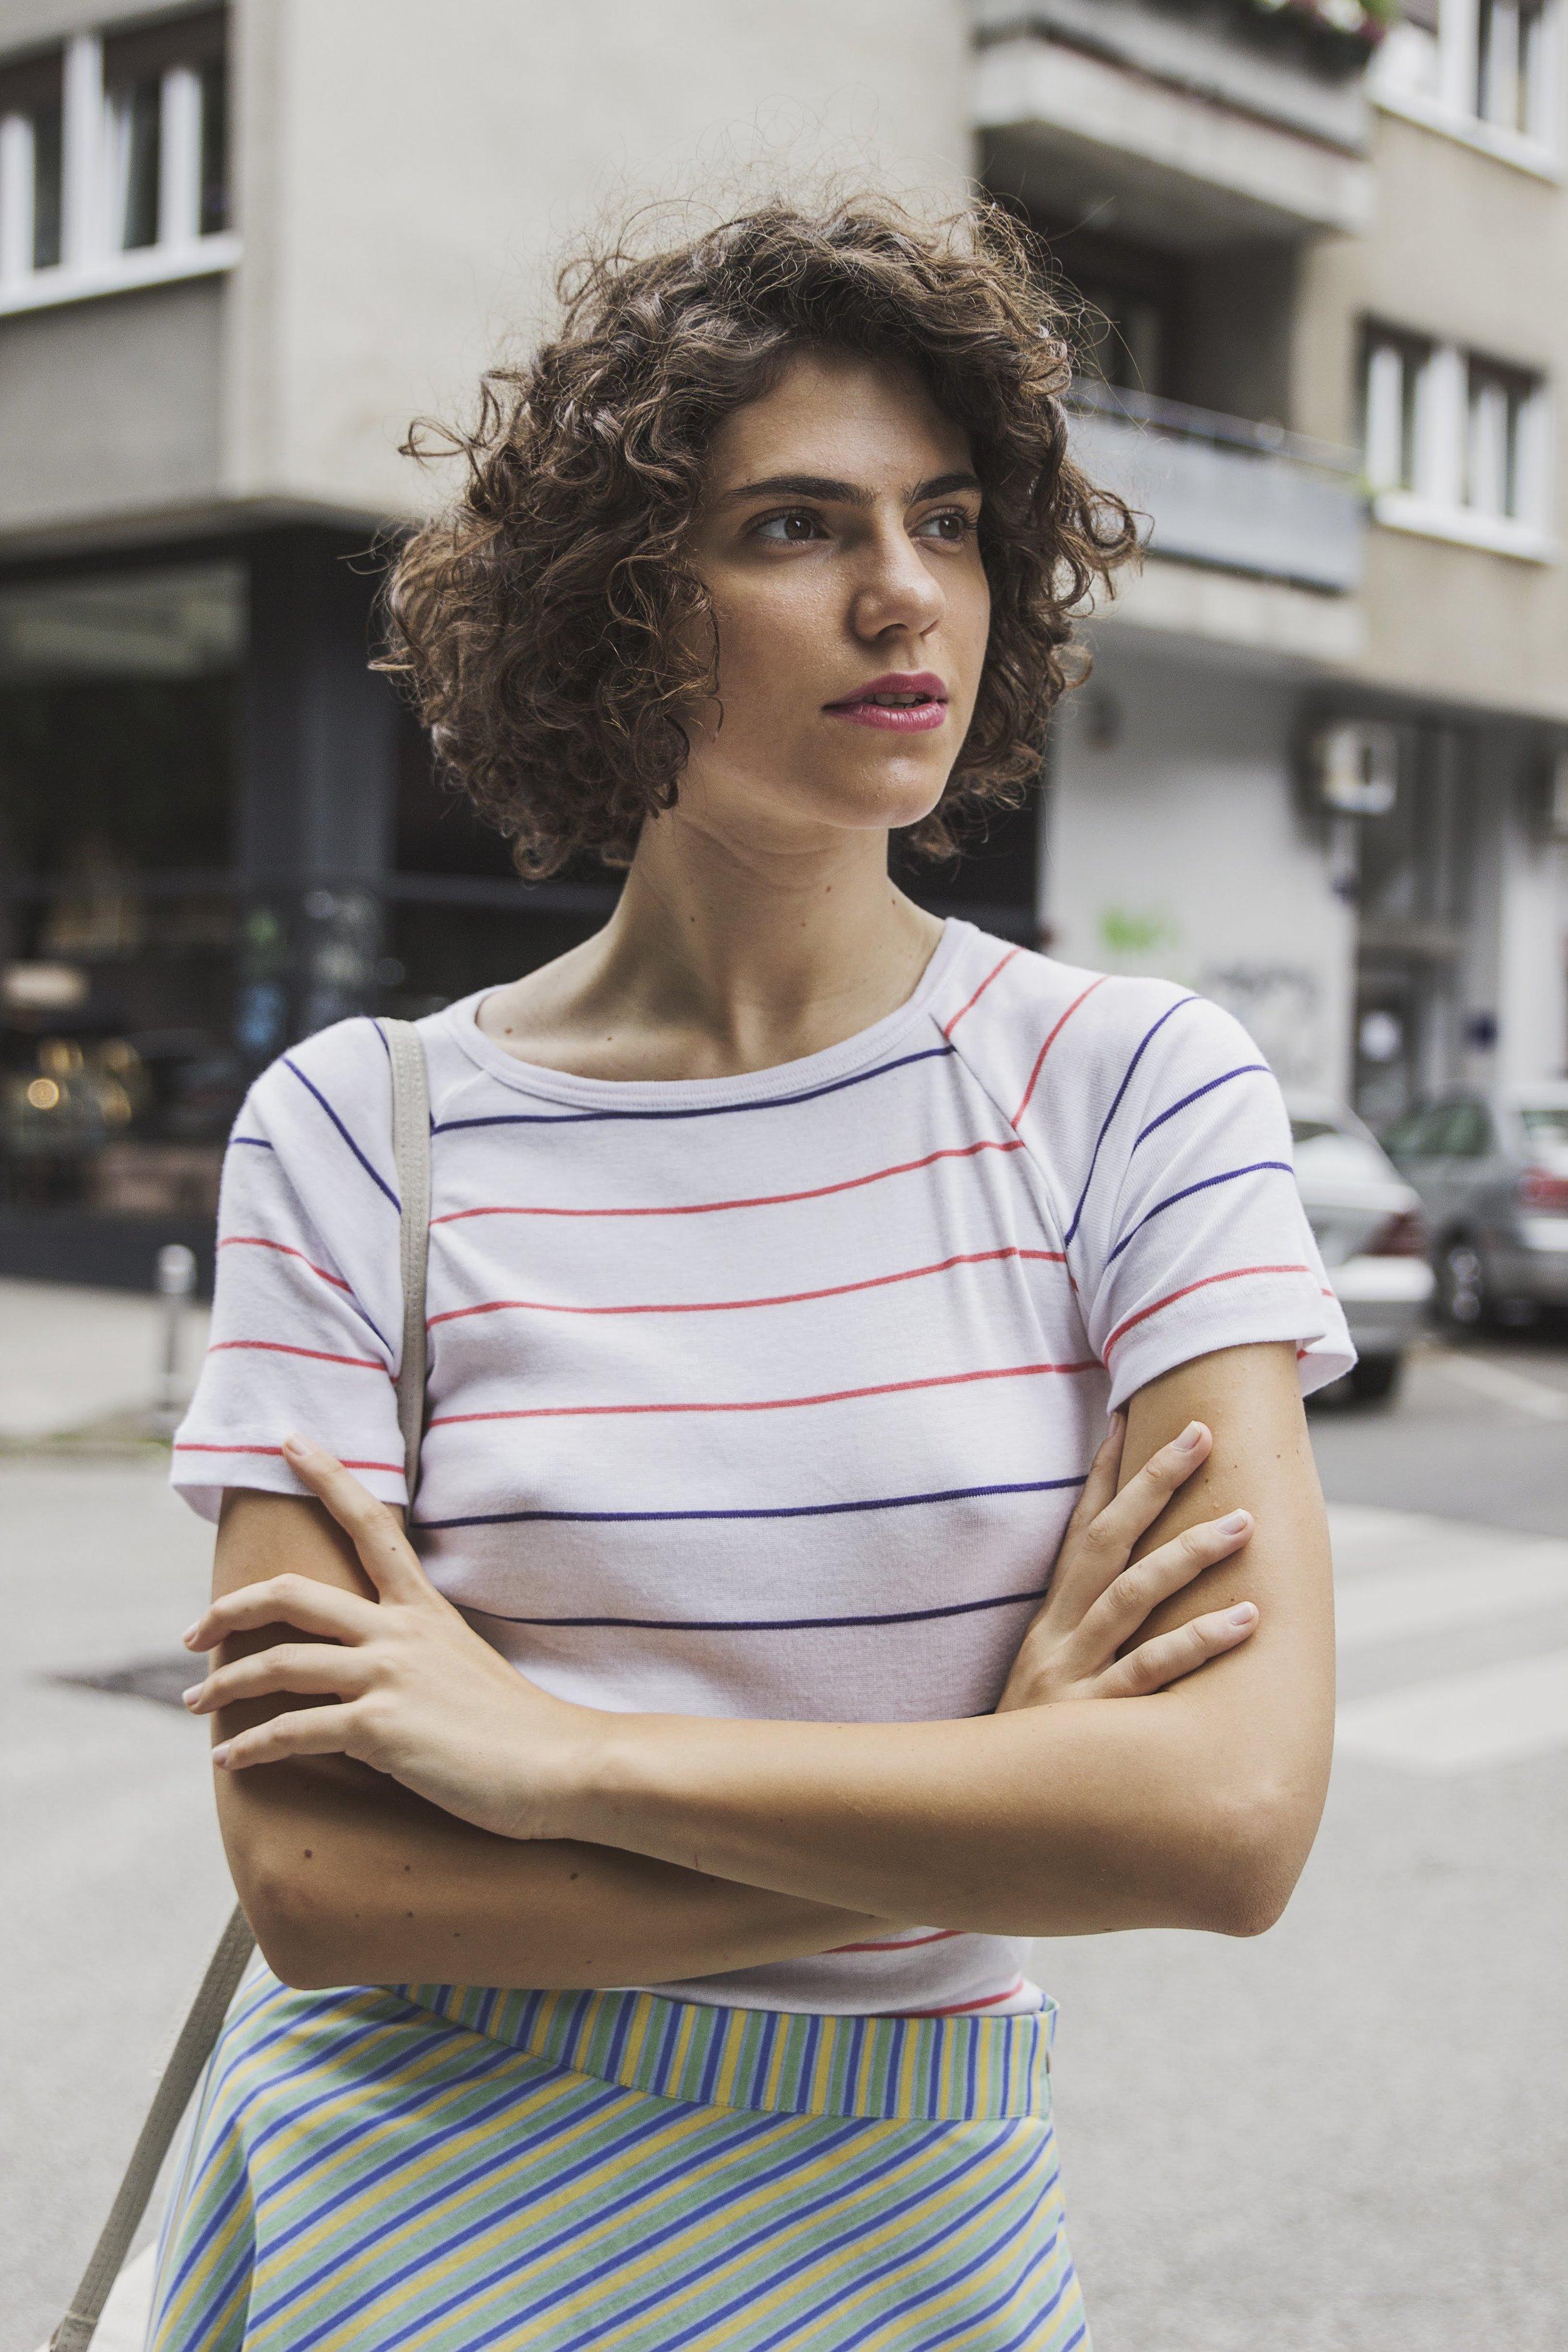 luka-lajic-fashion-photography-robert-sever-dizajner-croatian (7).jpg